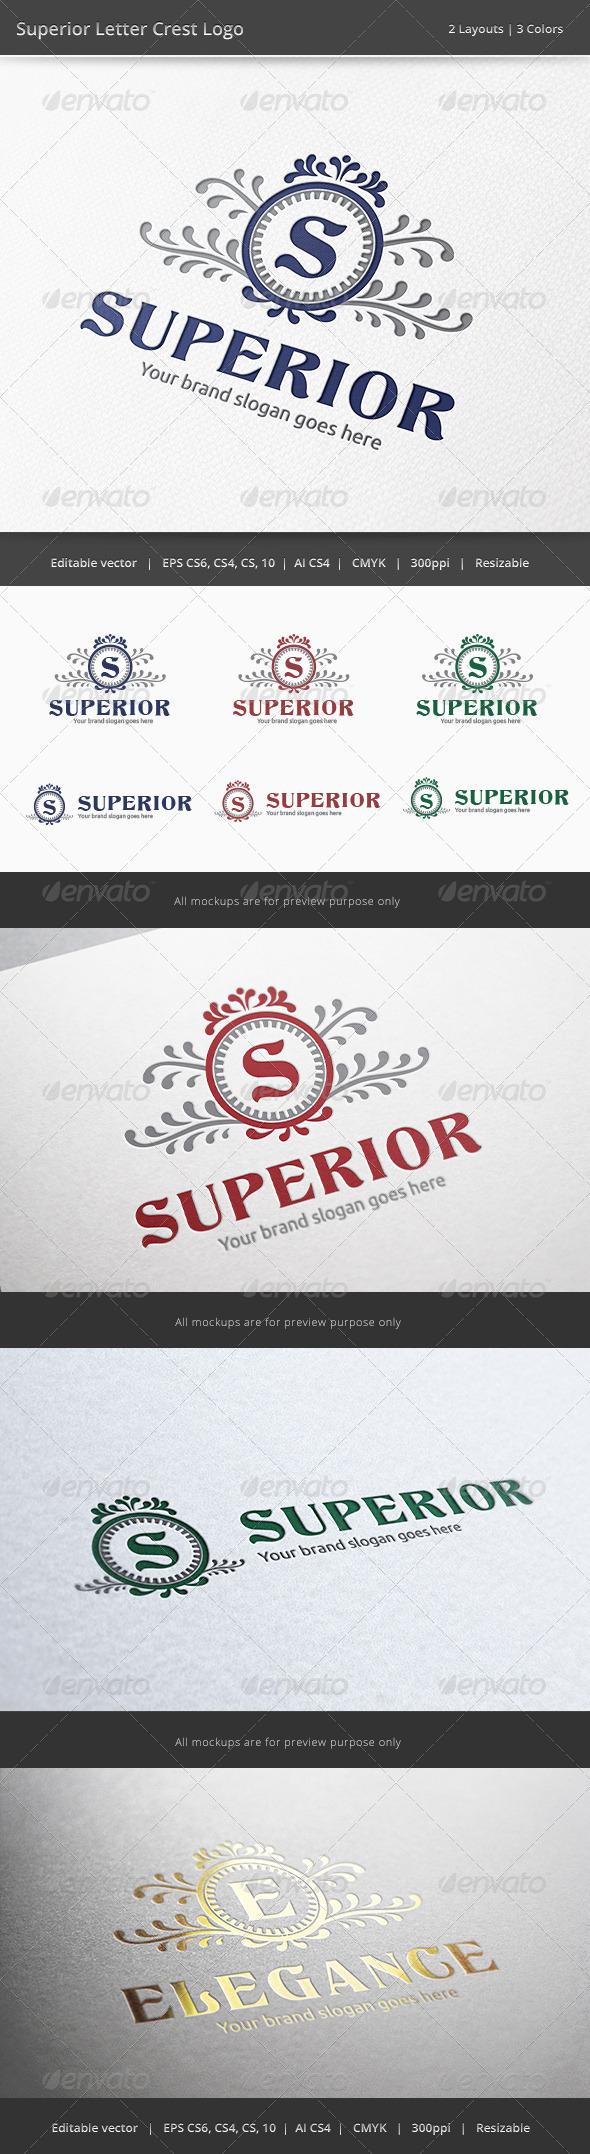 GraphicRiver Superior Letter Crest Logo 6379702